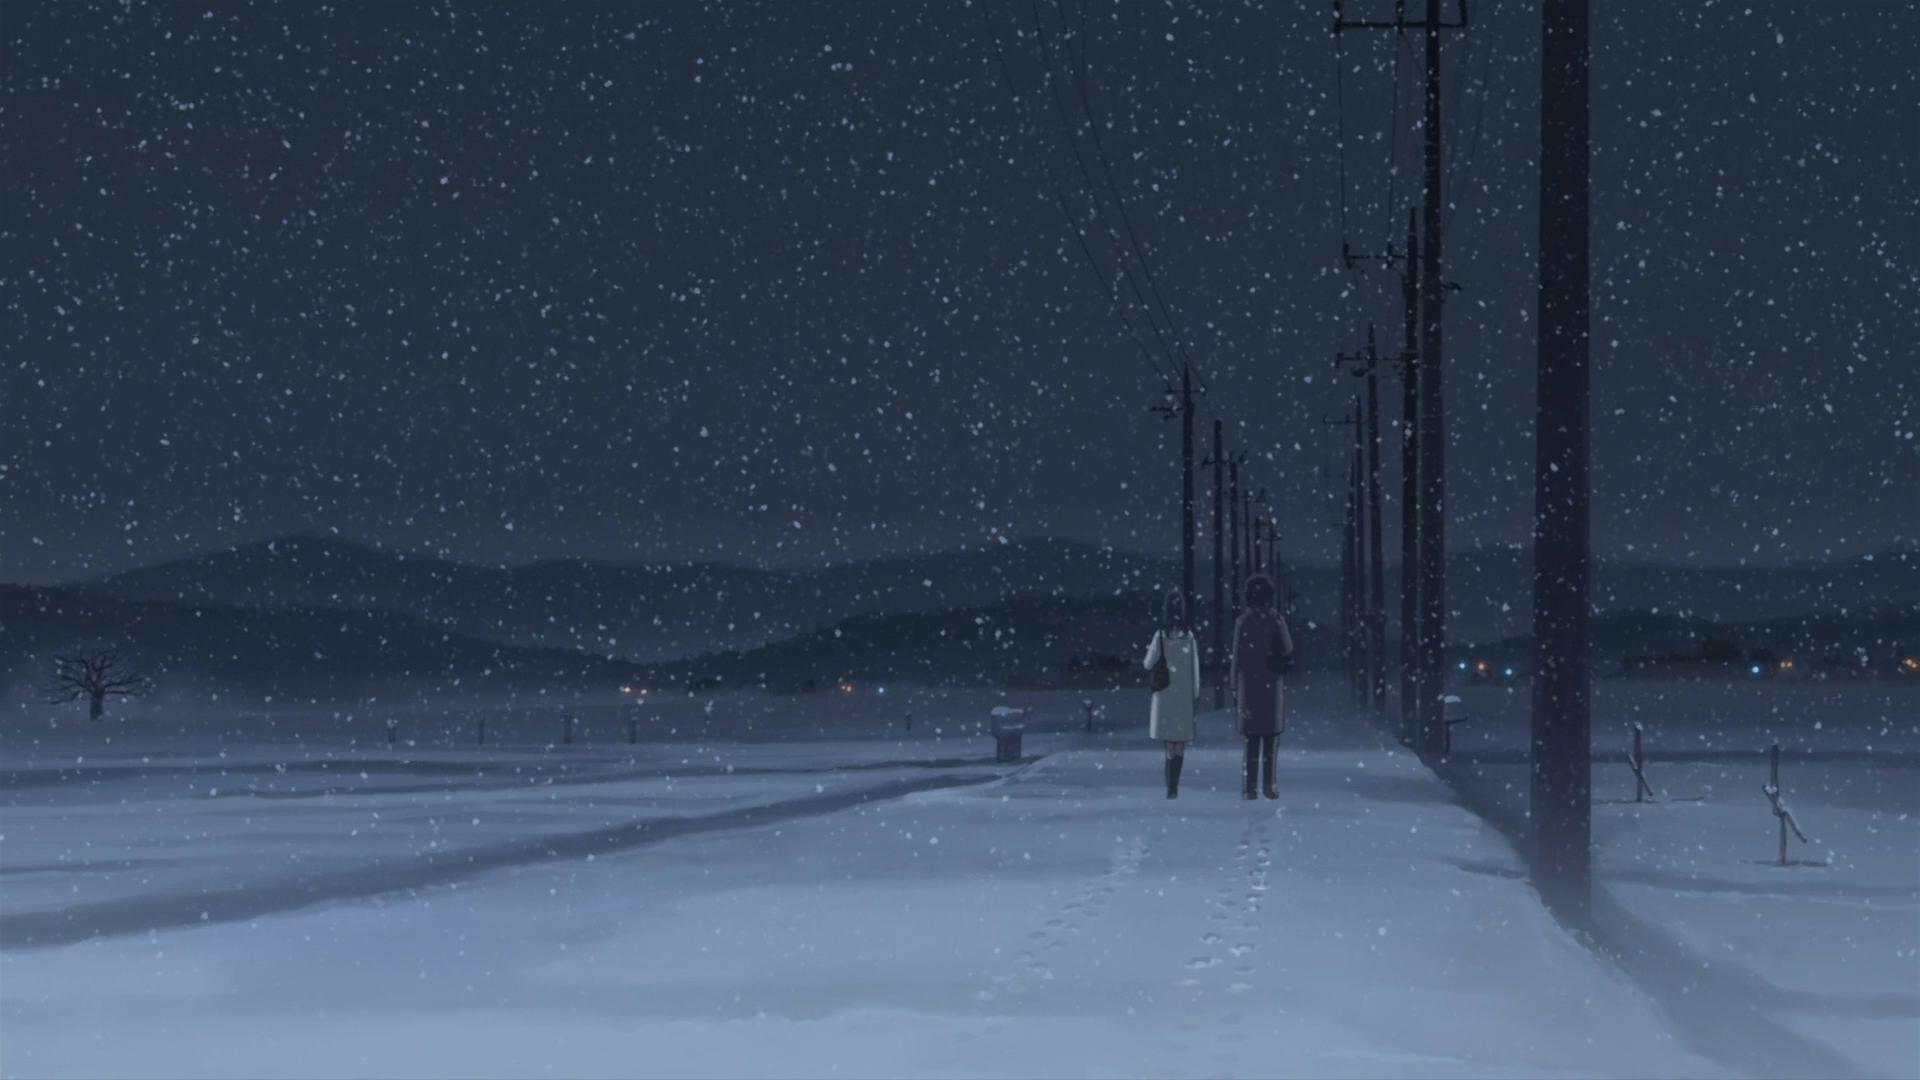 Falling Snow Desktop Wallpaper Winter Anime Wallpapers Wallpaper Cave